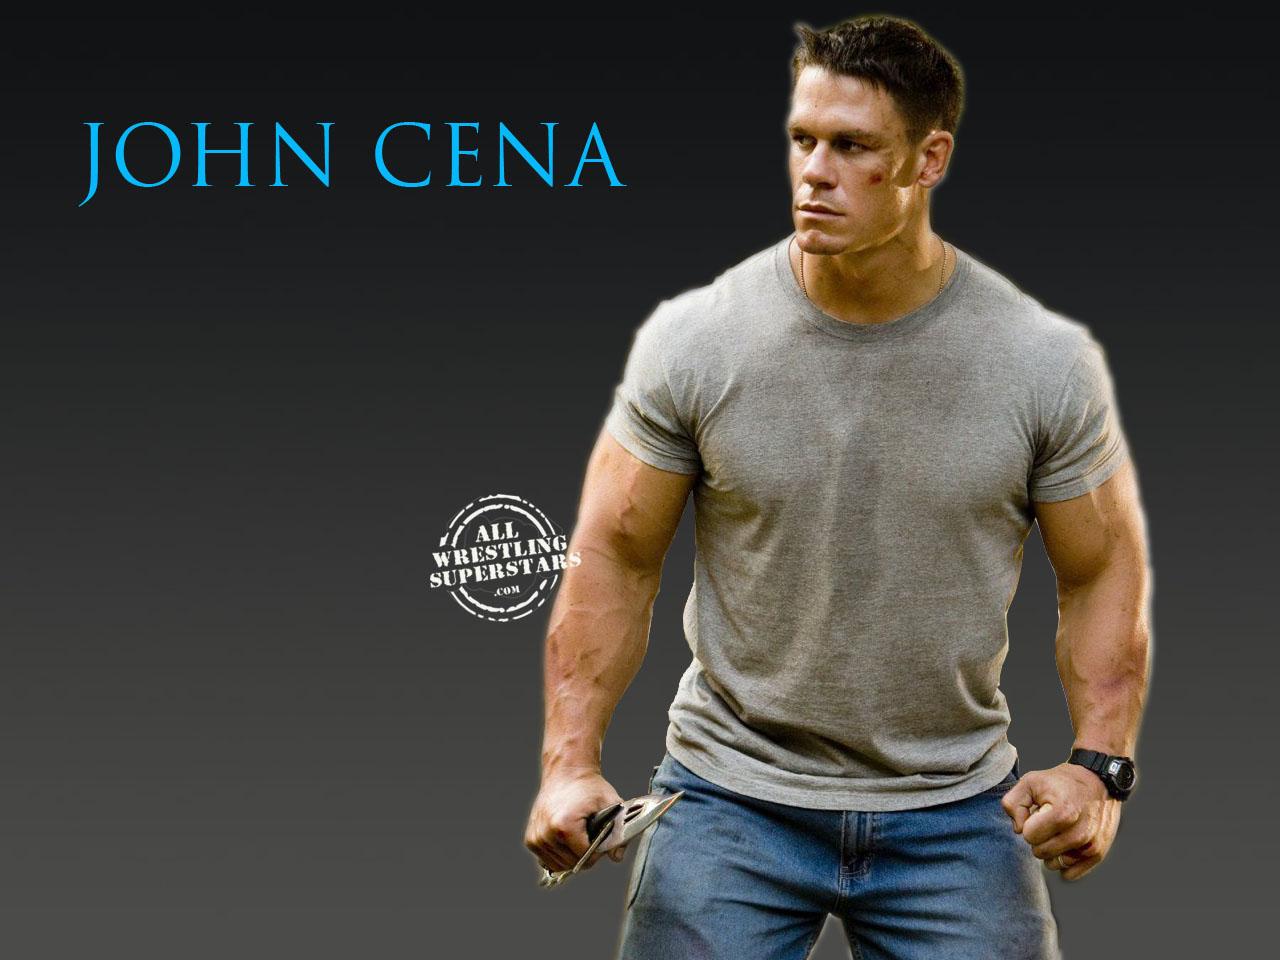 images of wwe superstar john cena